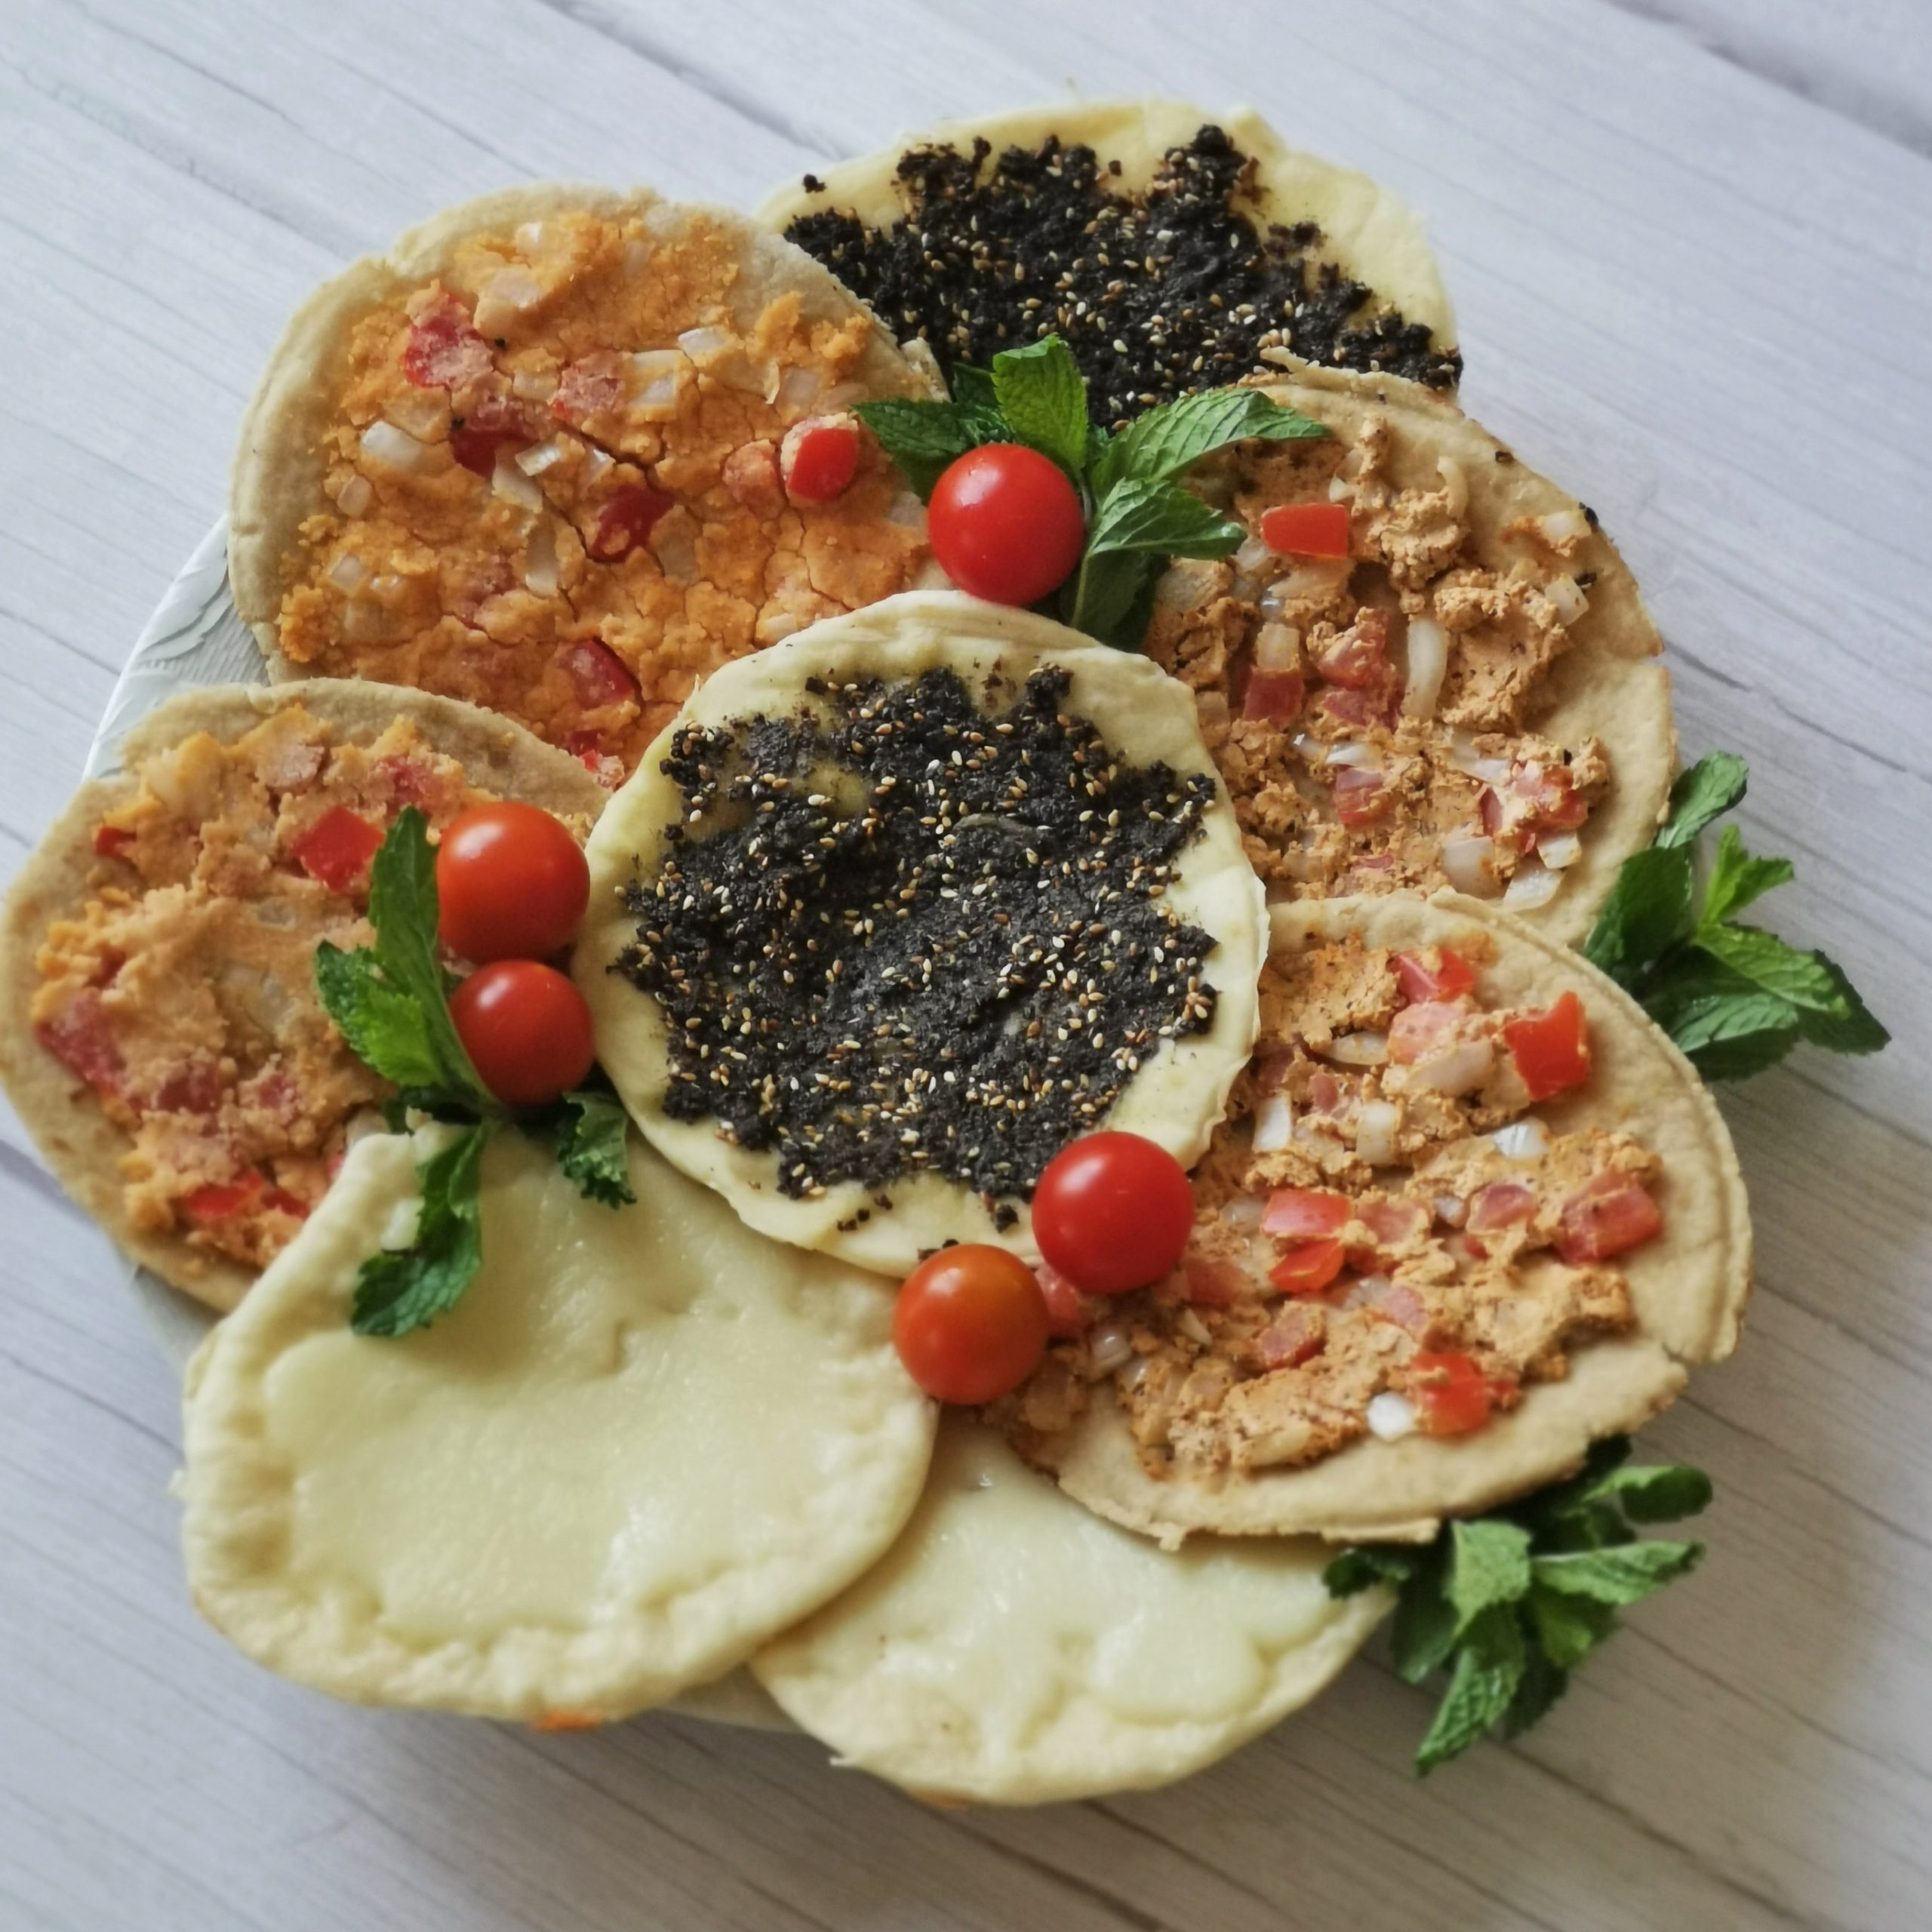 A mix of Lebanese manakish